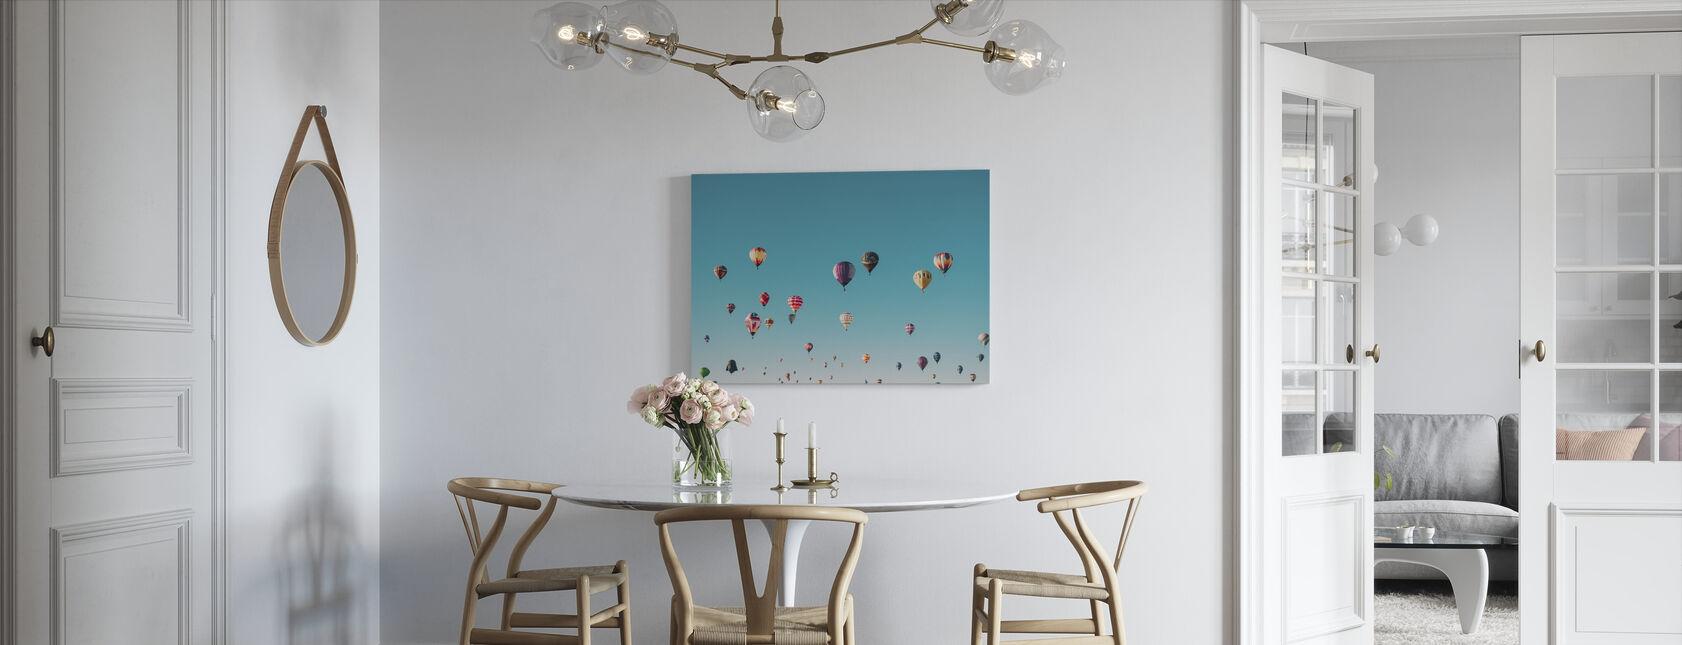 Hete Luchtballonnen - Canvas print - Keuken